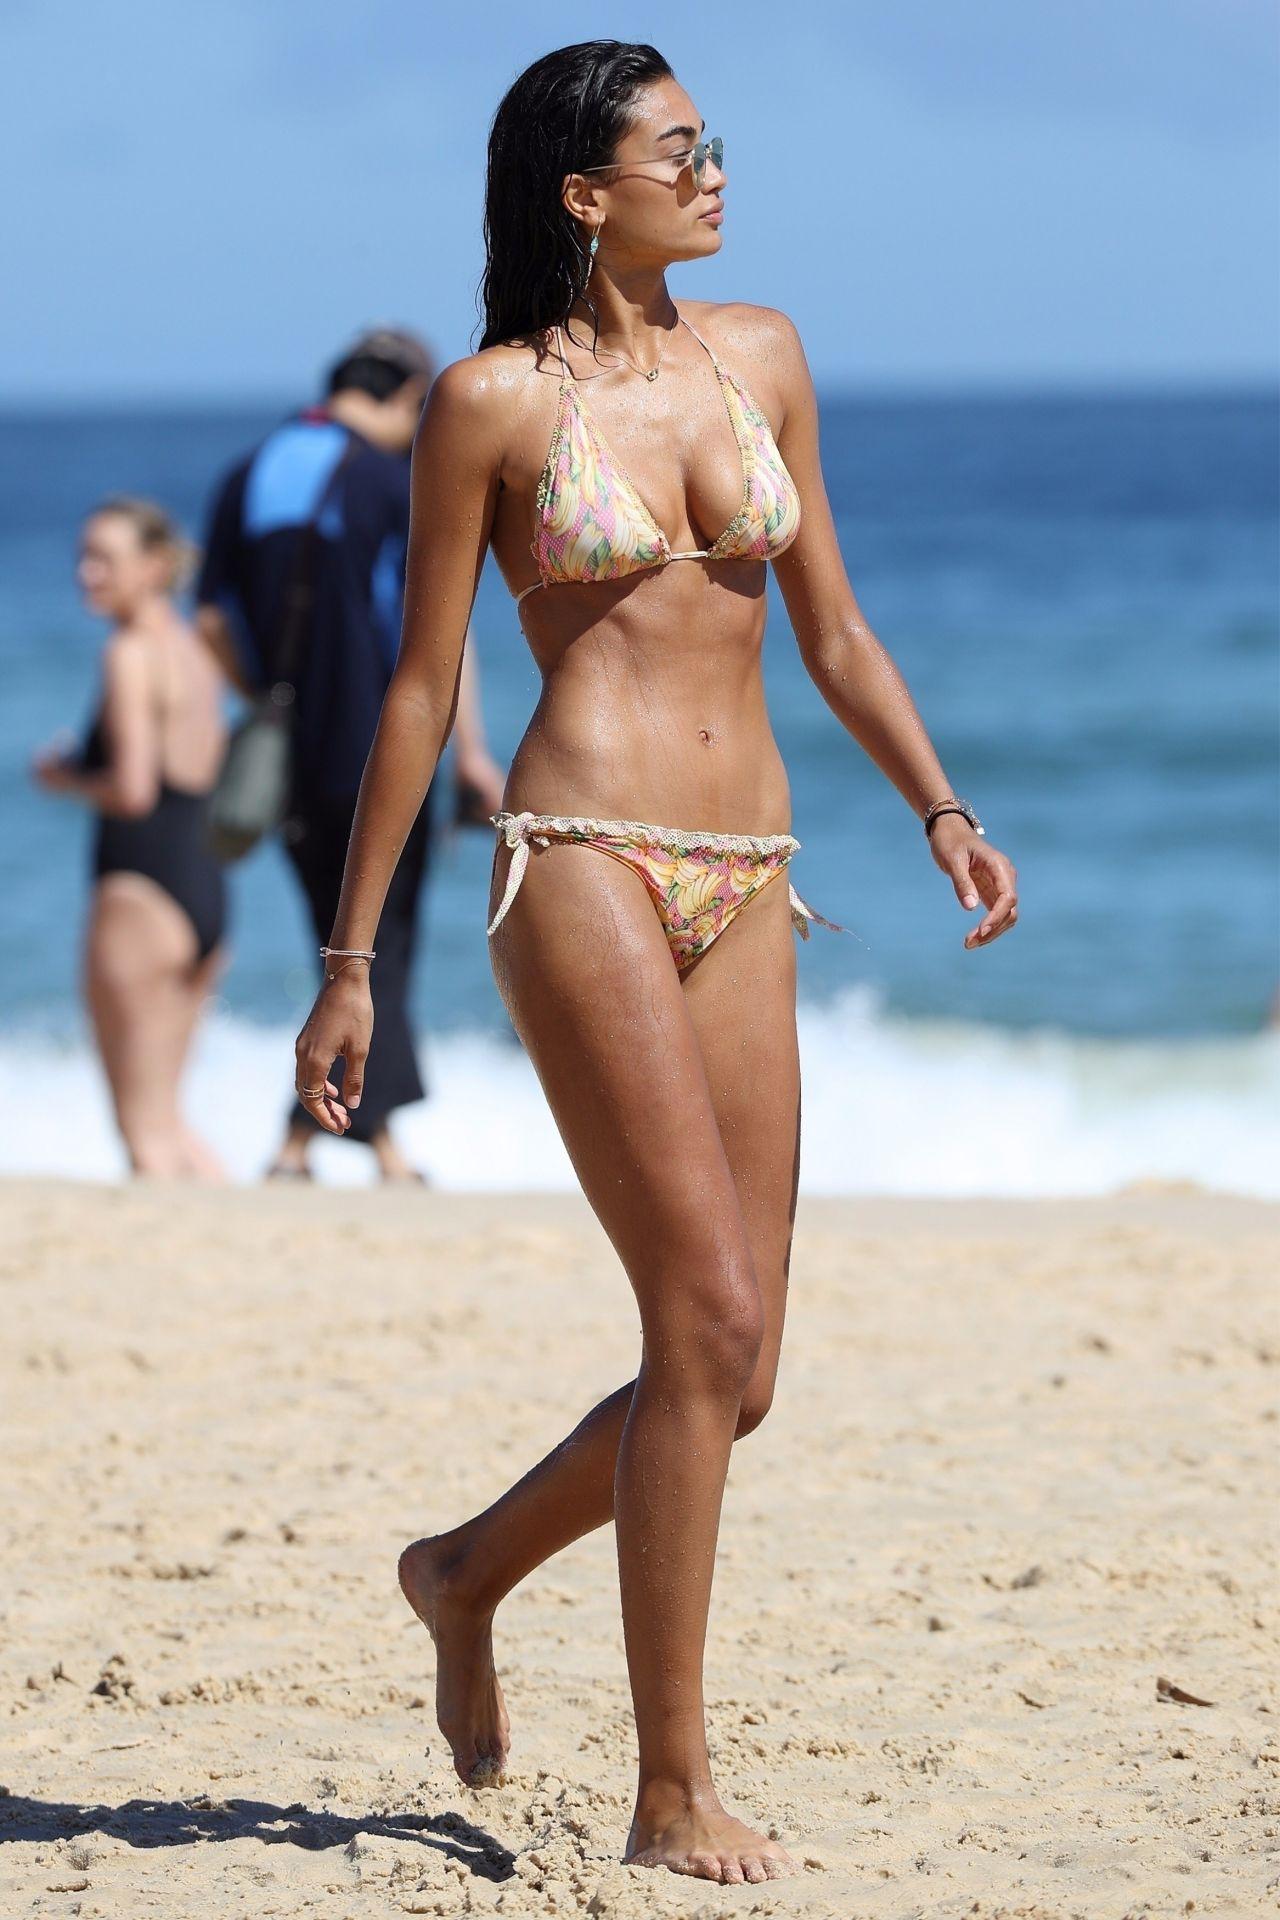 Kelly Gale in Bikini on Bondi Beach in Sydney Pic 11 of 35